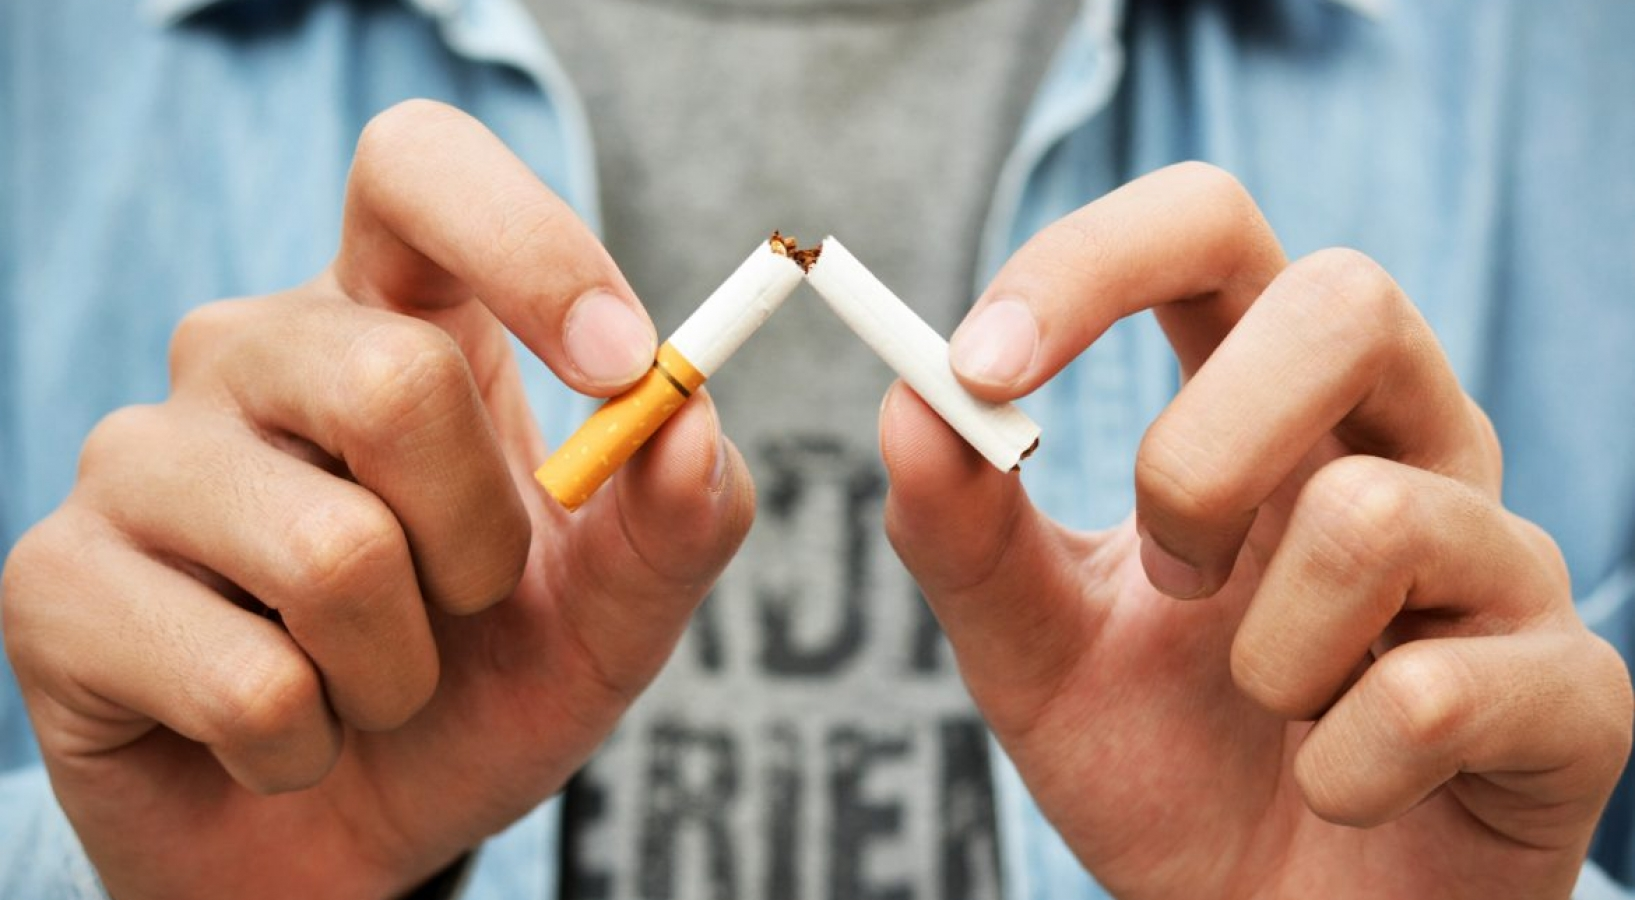 Io non me la fumo